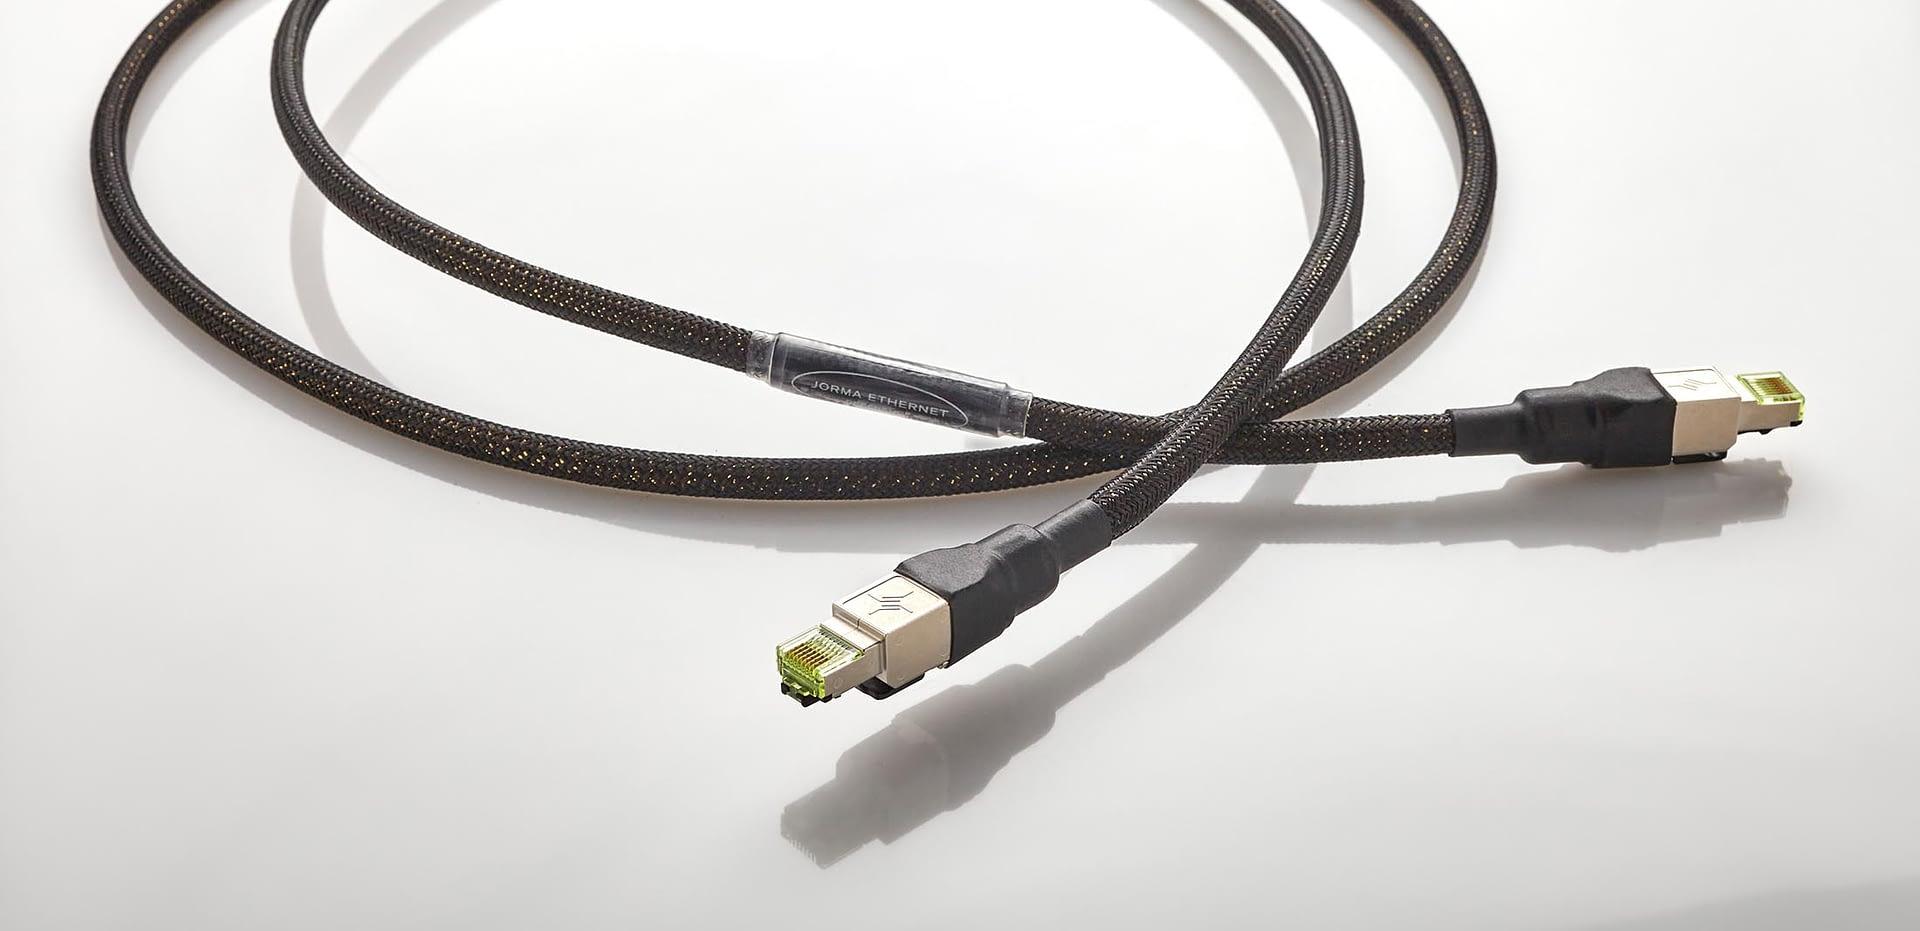 Jorma Ethernet